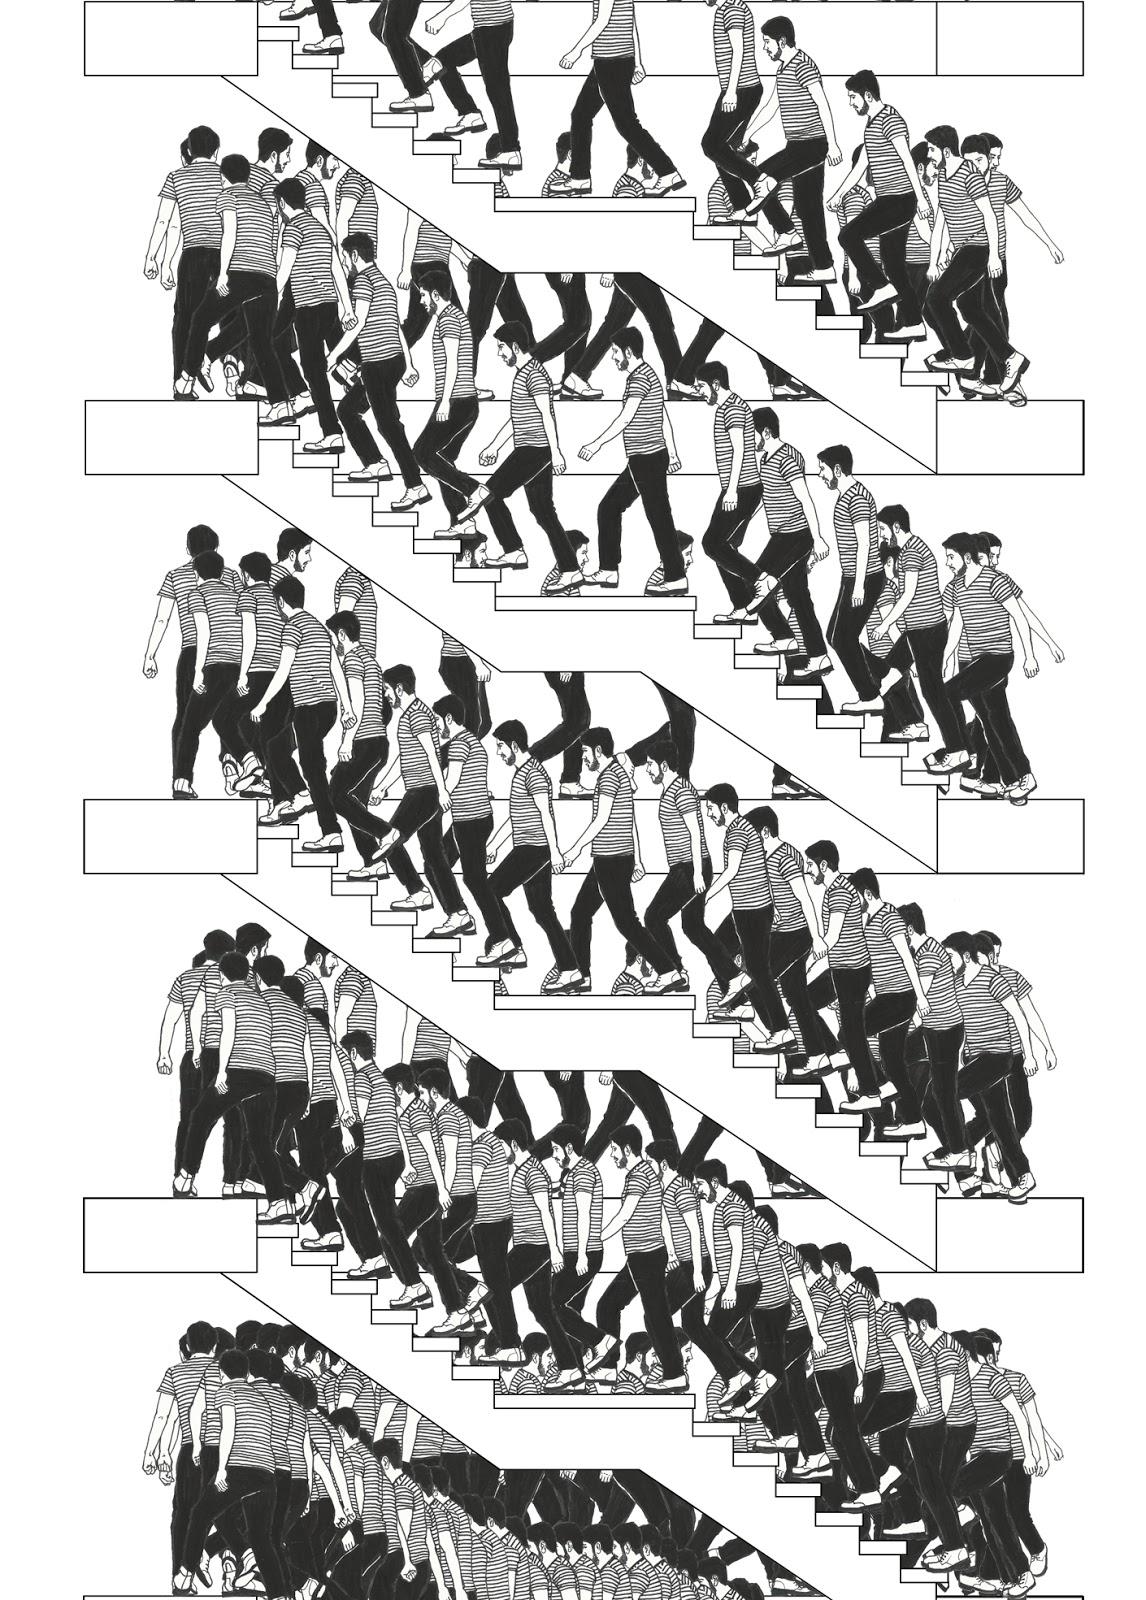 Manuel calder n dibujos escaleras infinitas for Escaleras infinitas